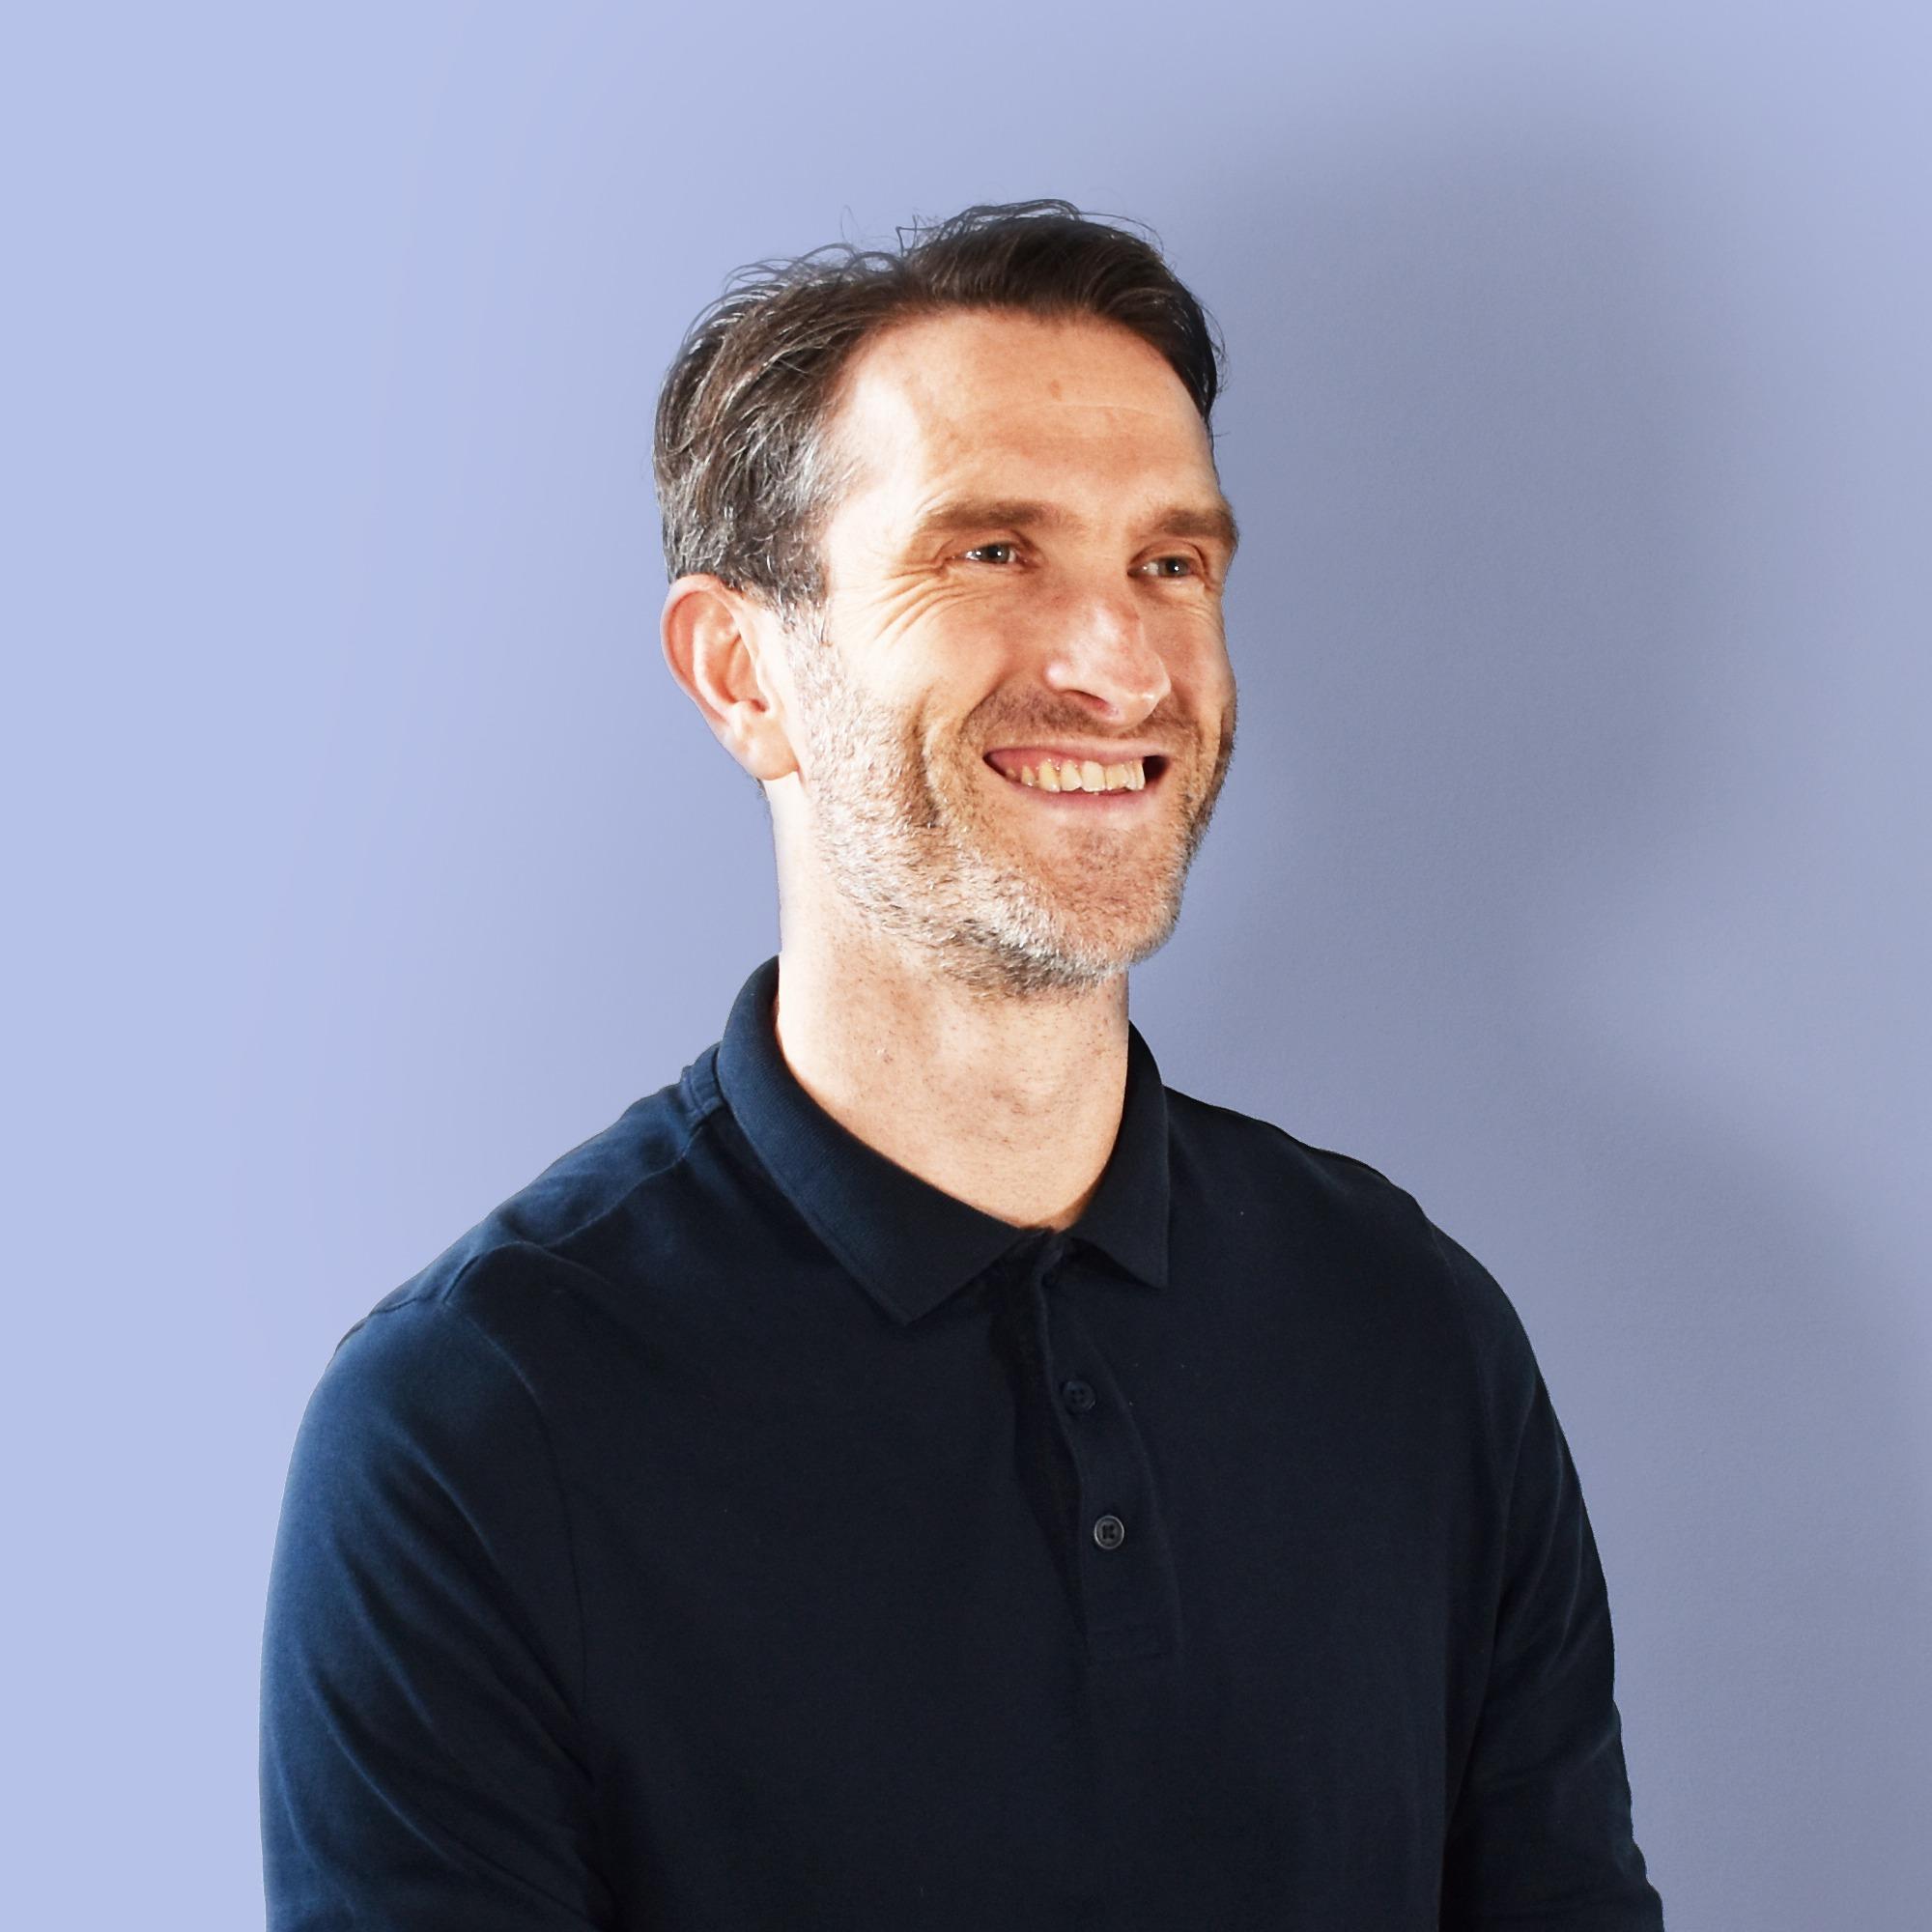 Gareth Tudor